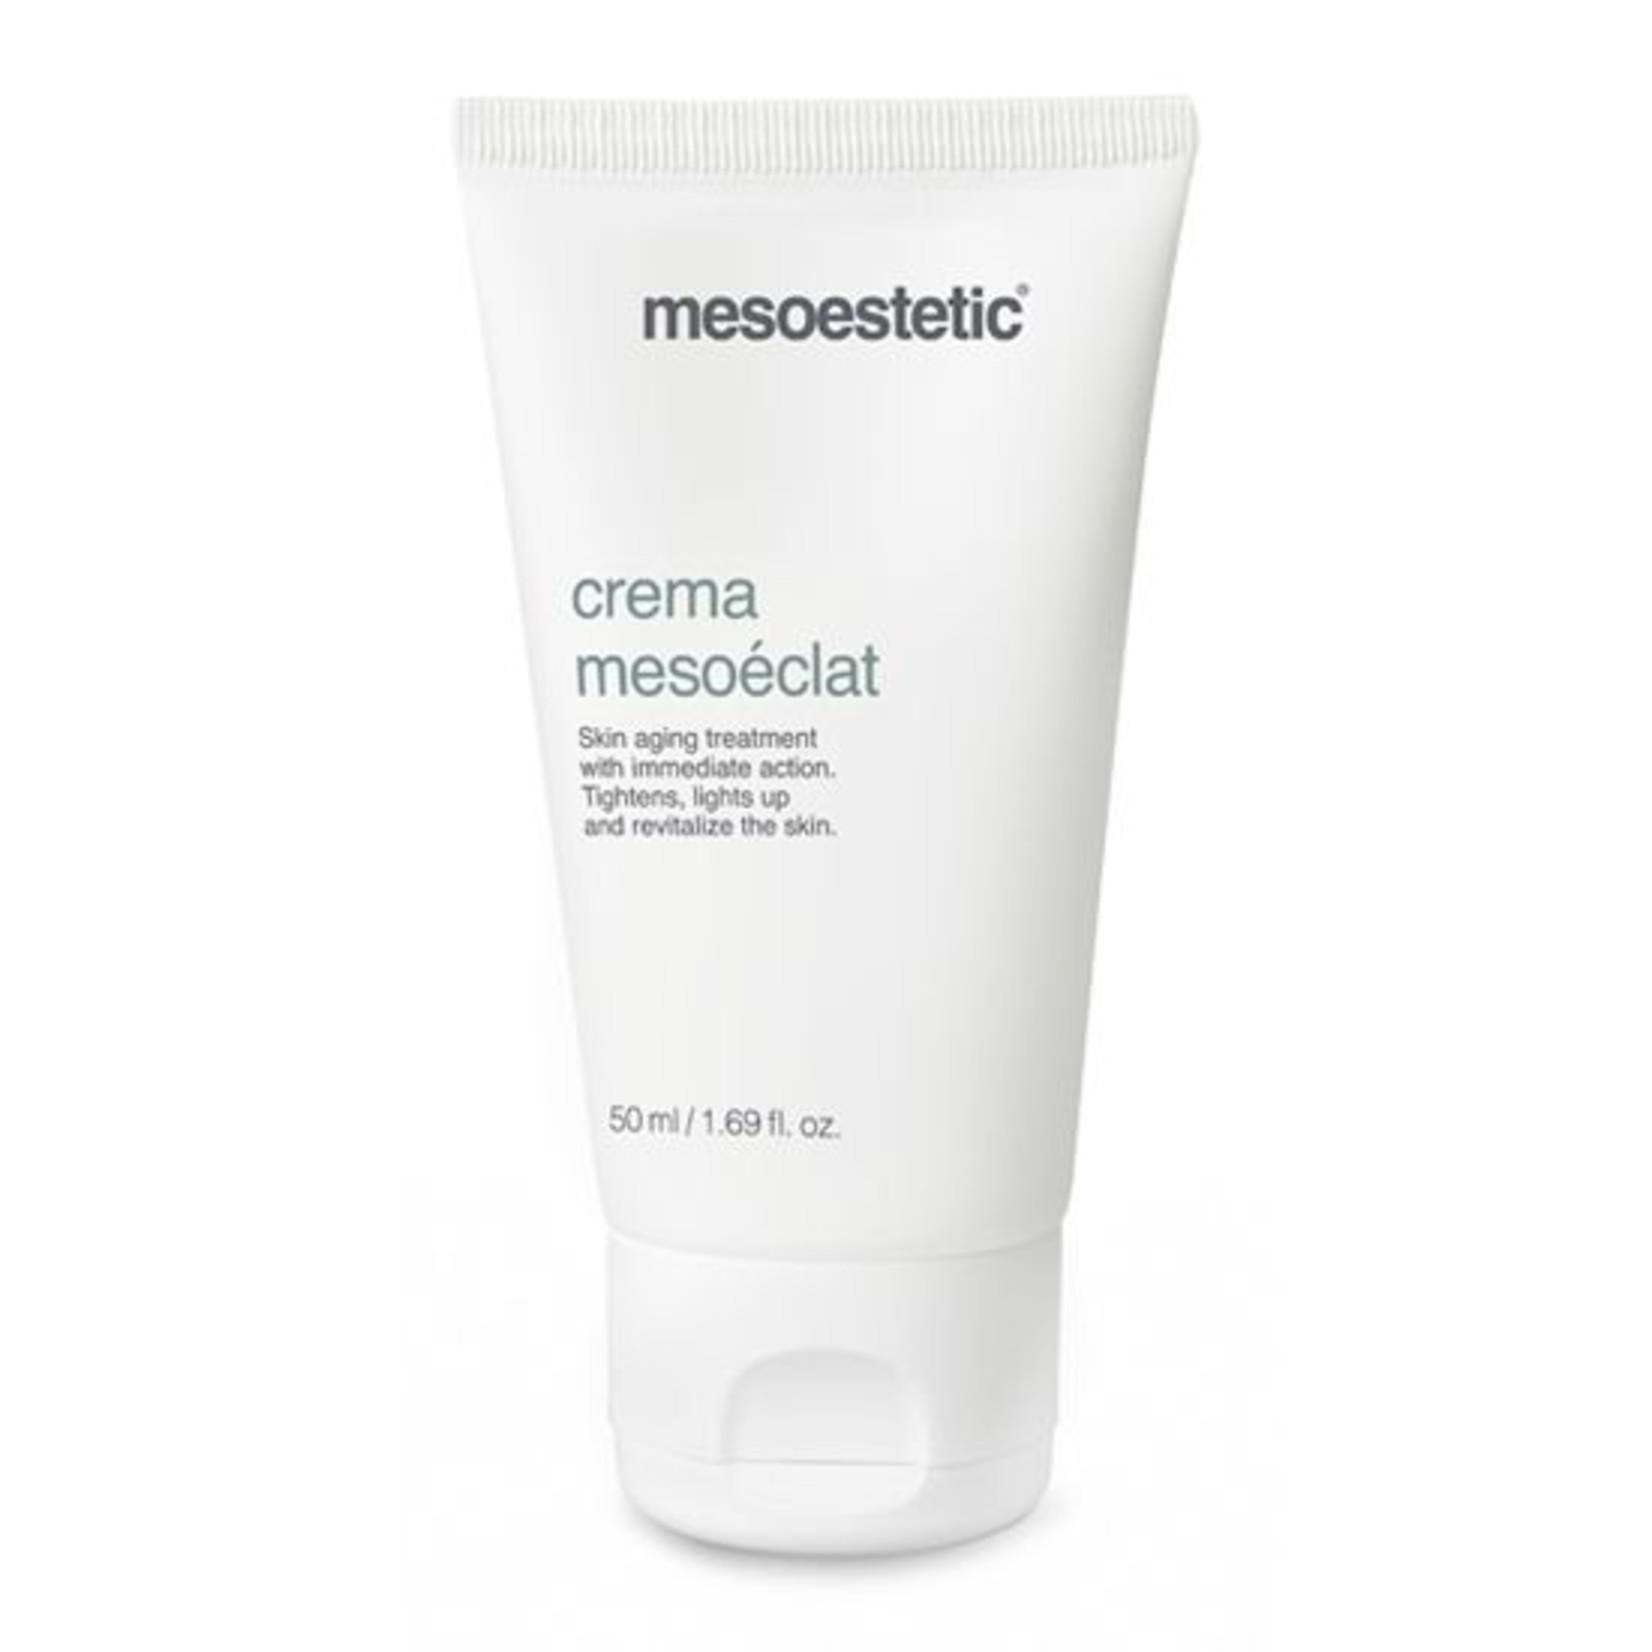 Mesoestetic Crème Mesoéclat